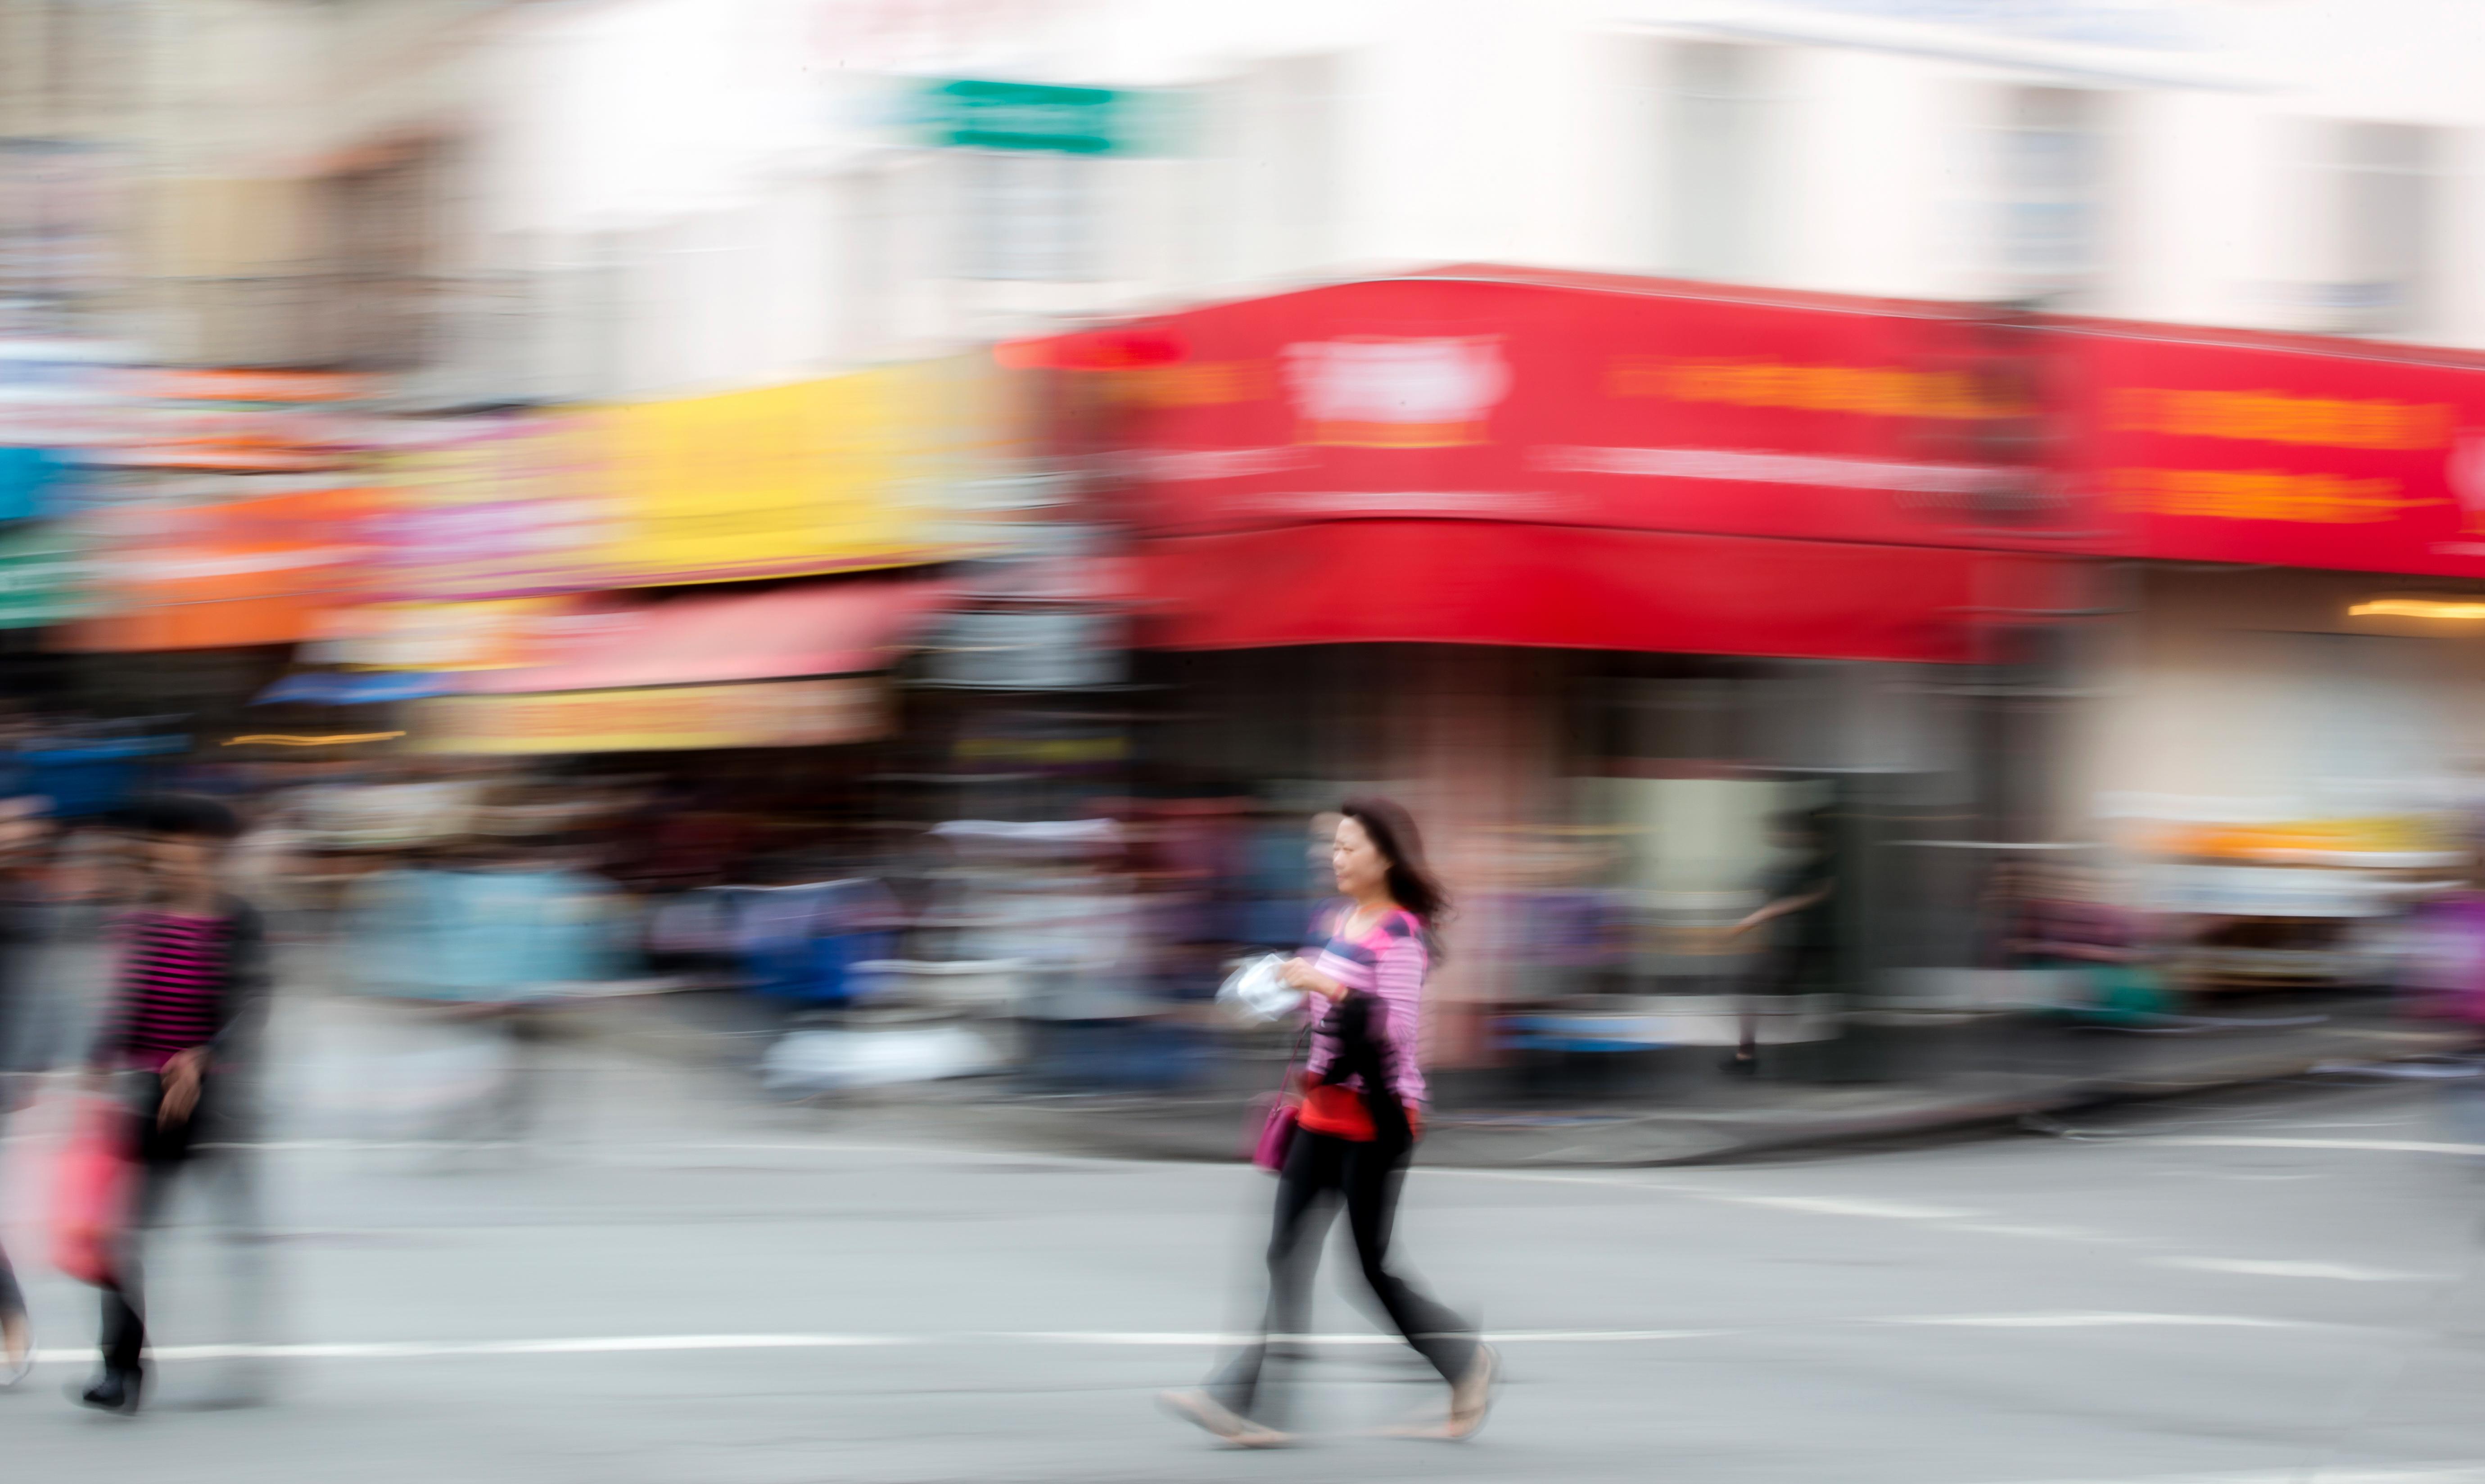 Zipping Across the Street